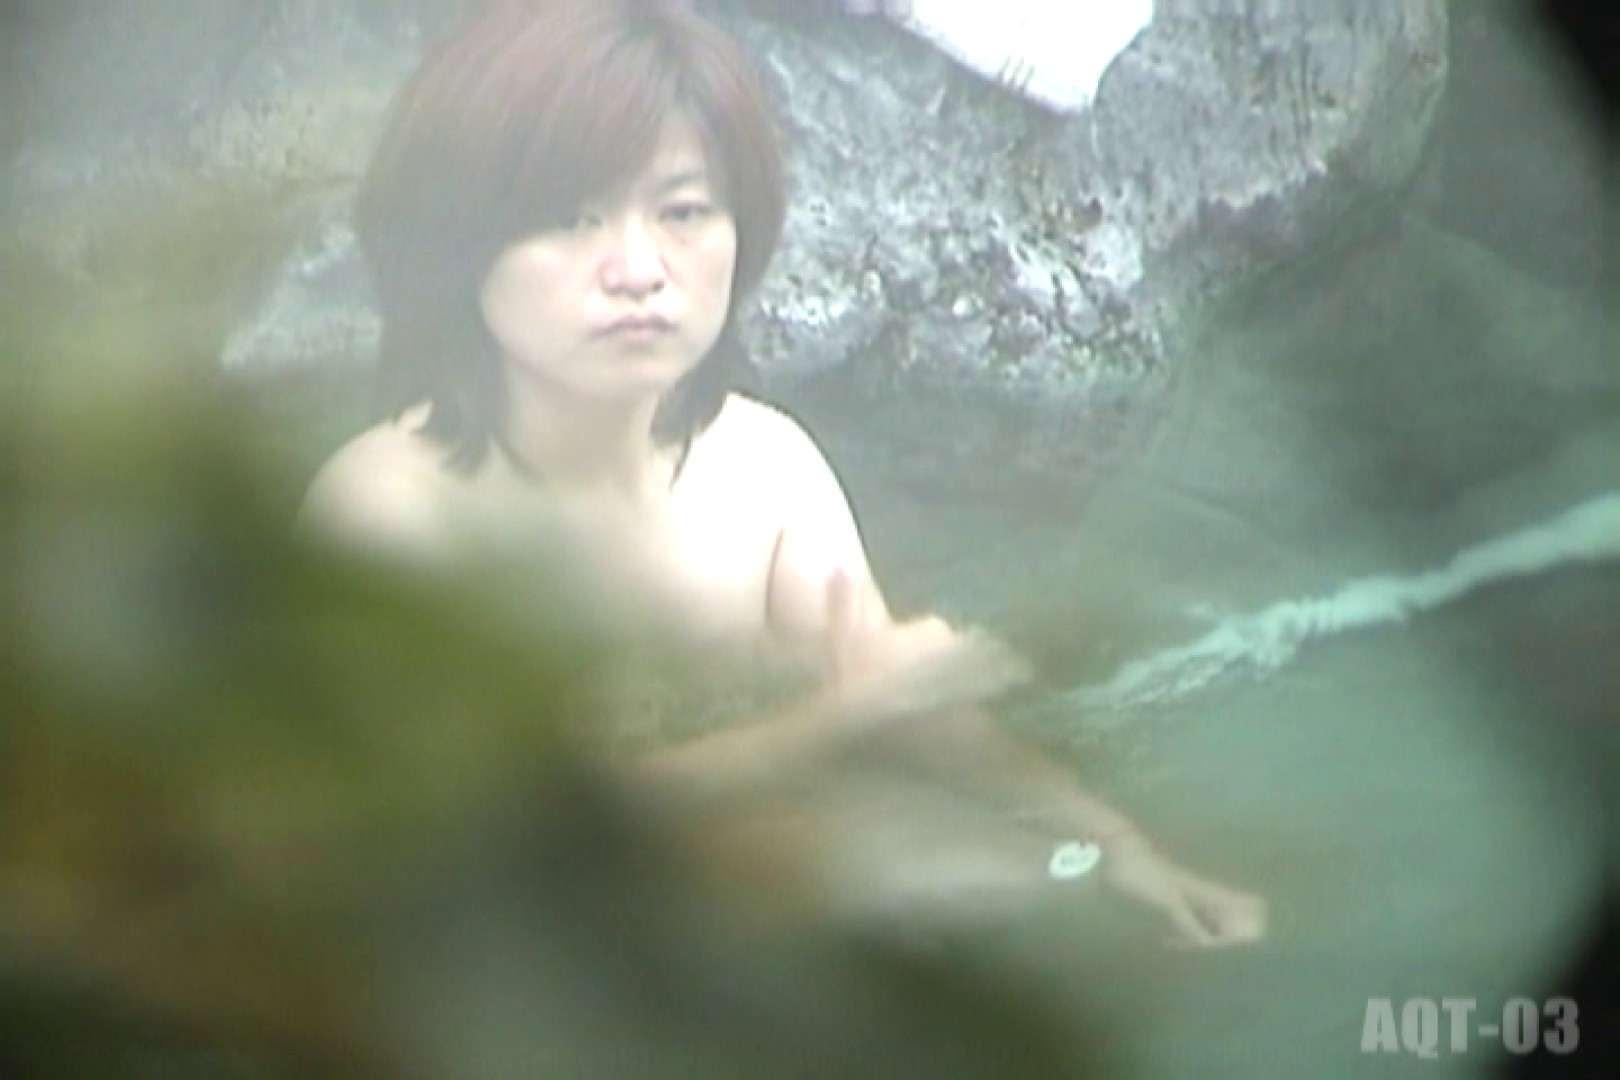 Aquaな露天風呂Vol.731 盗撮師作品  91pic 69